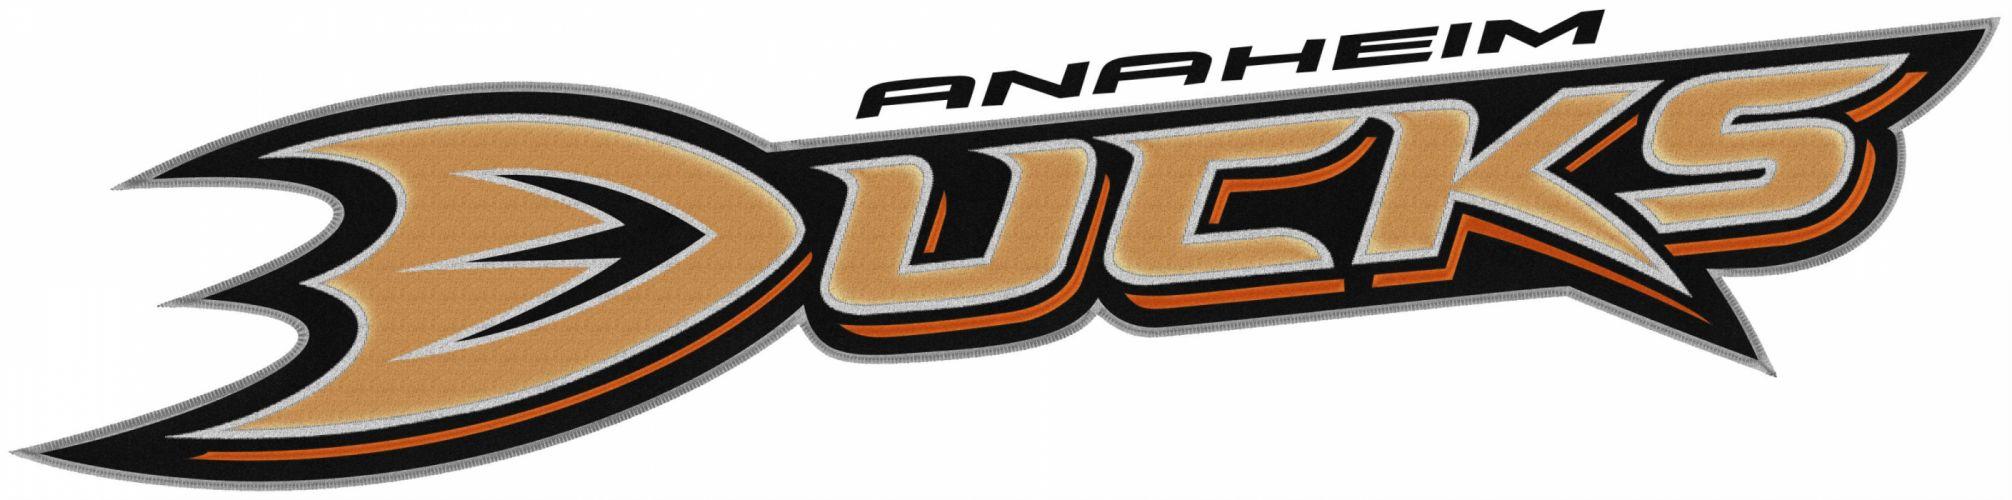 ANAHEIM DUCKS nhl hockey (78) wallpaper